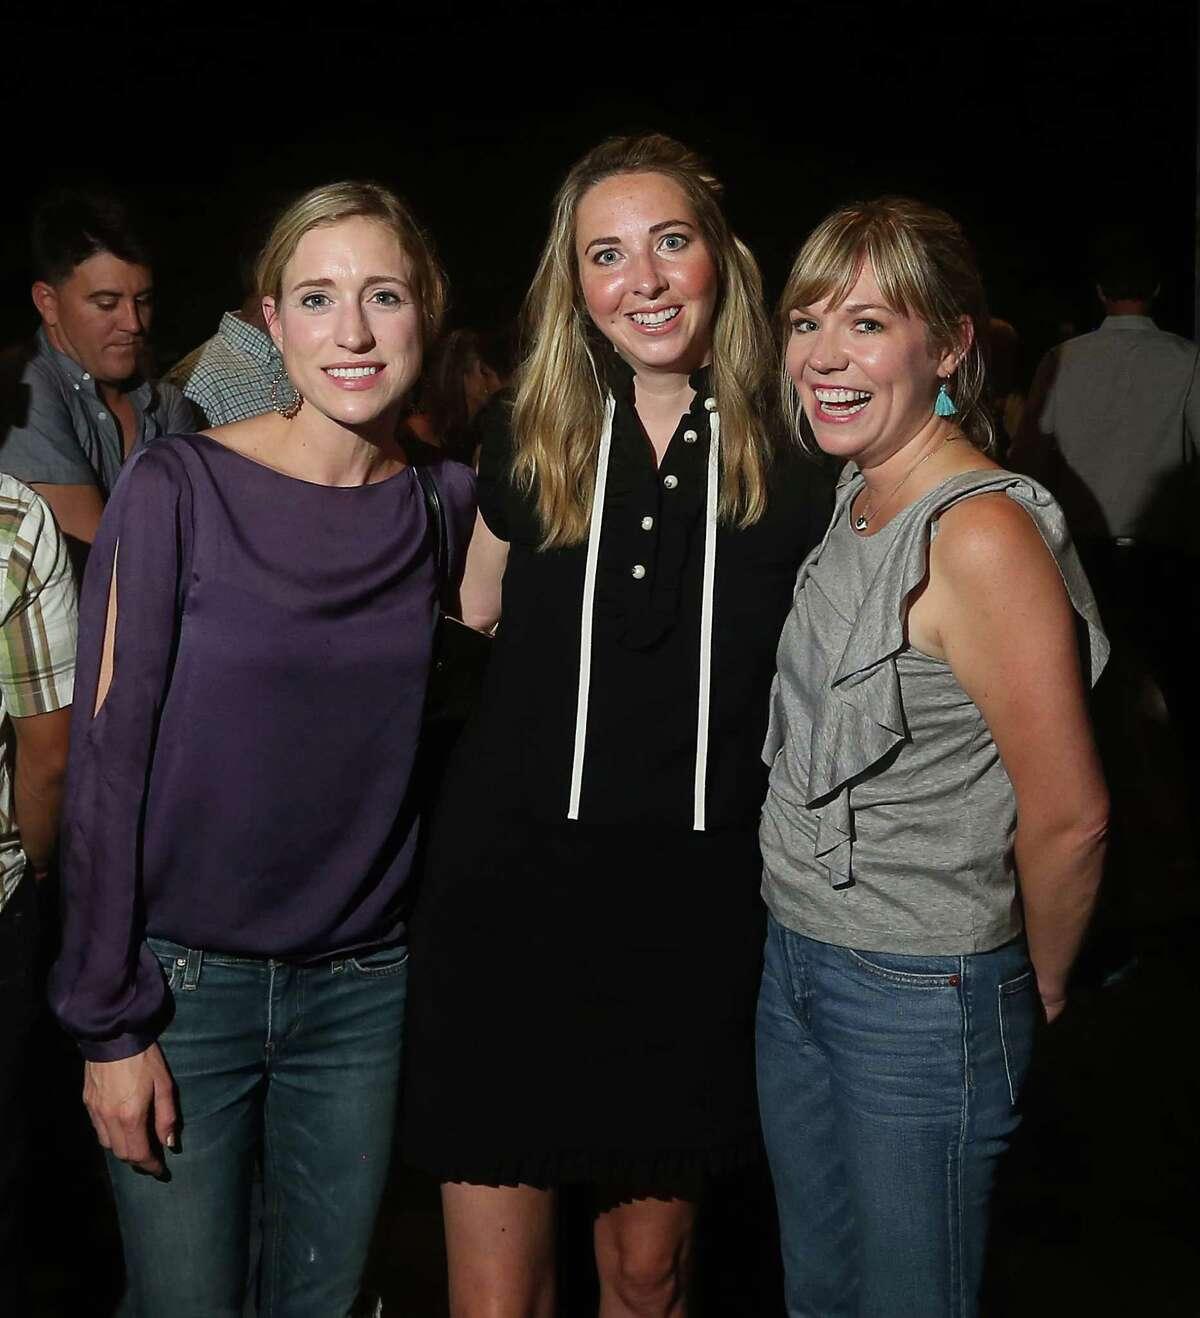 Laura Garwood, Amanda Blackwell and Caroline Kerr